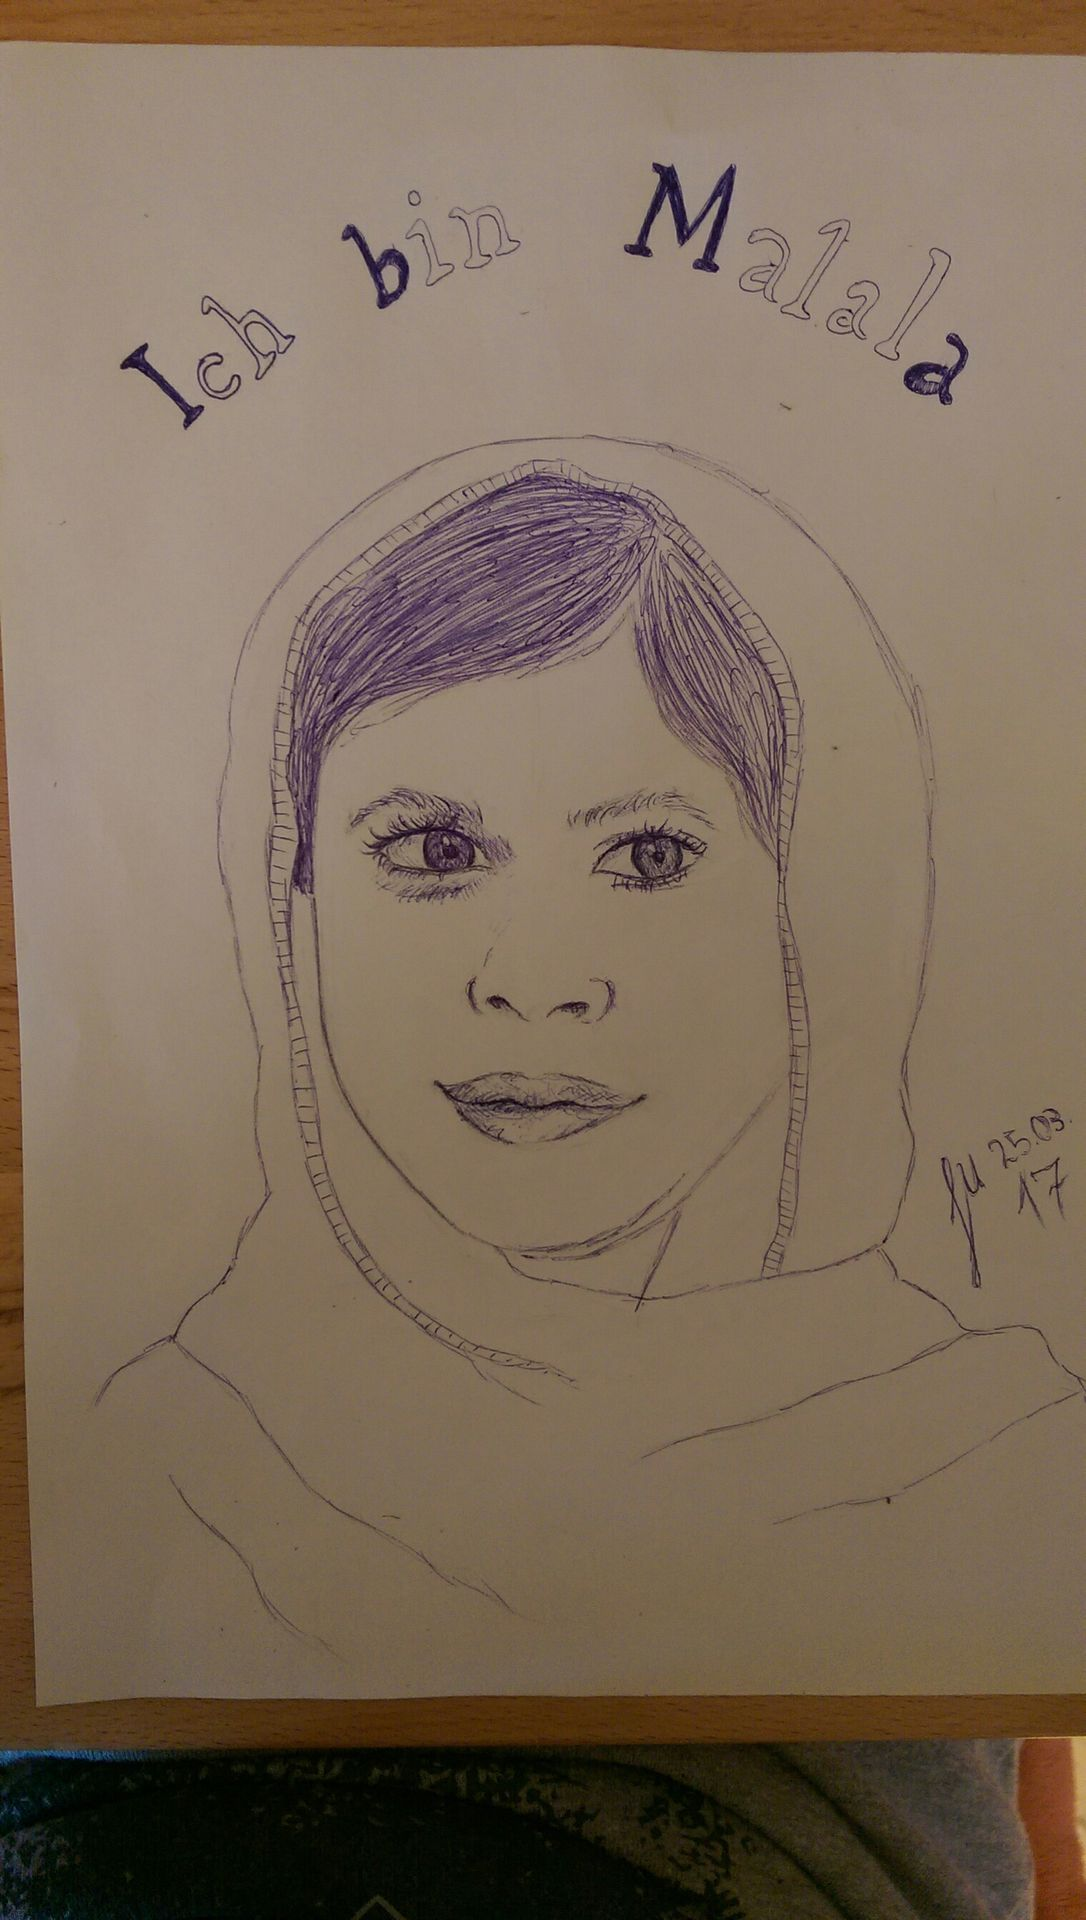 Zeichenbuch 18 - Ich bin Malala - Wattpad